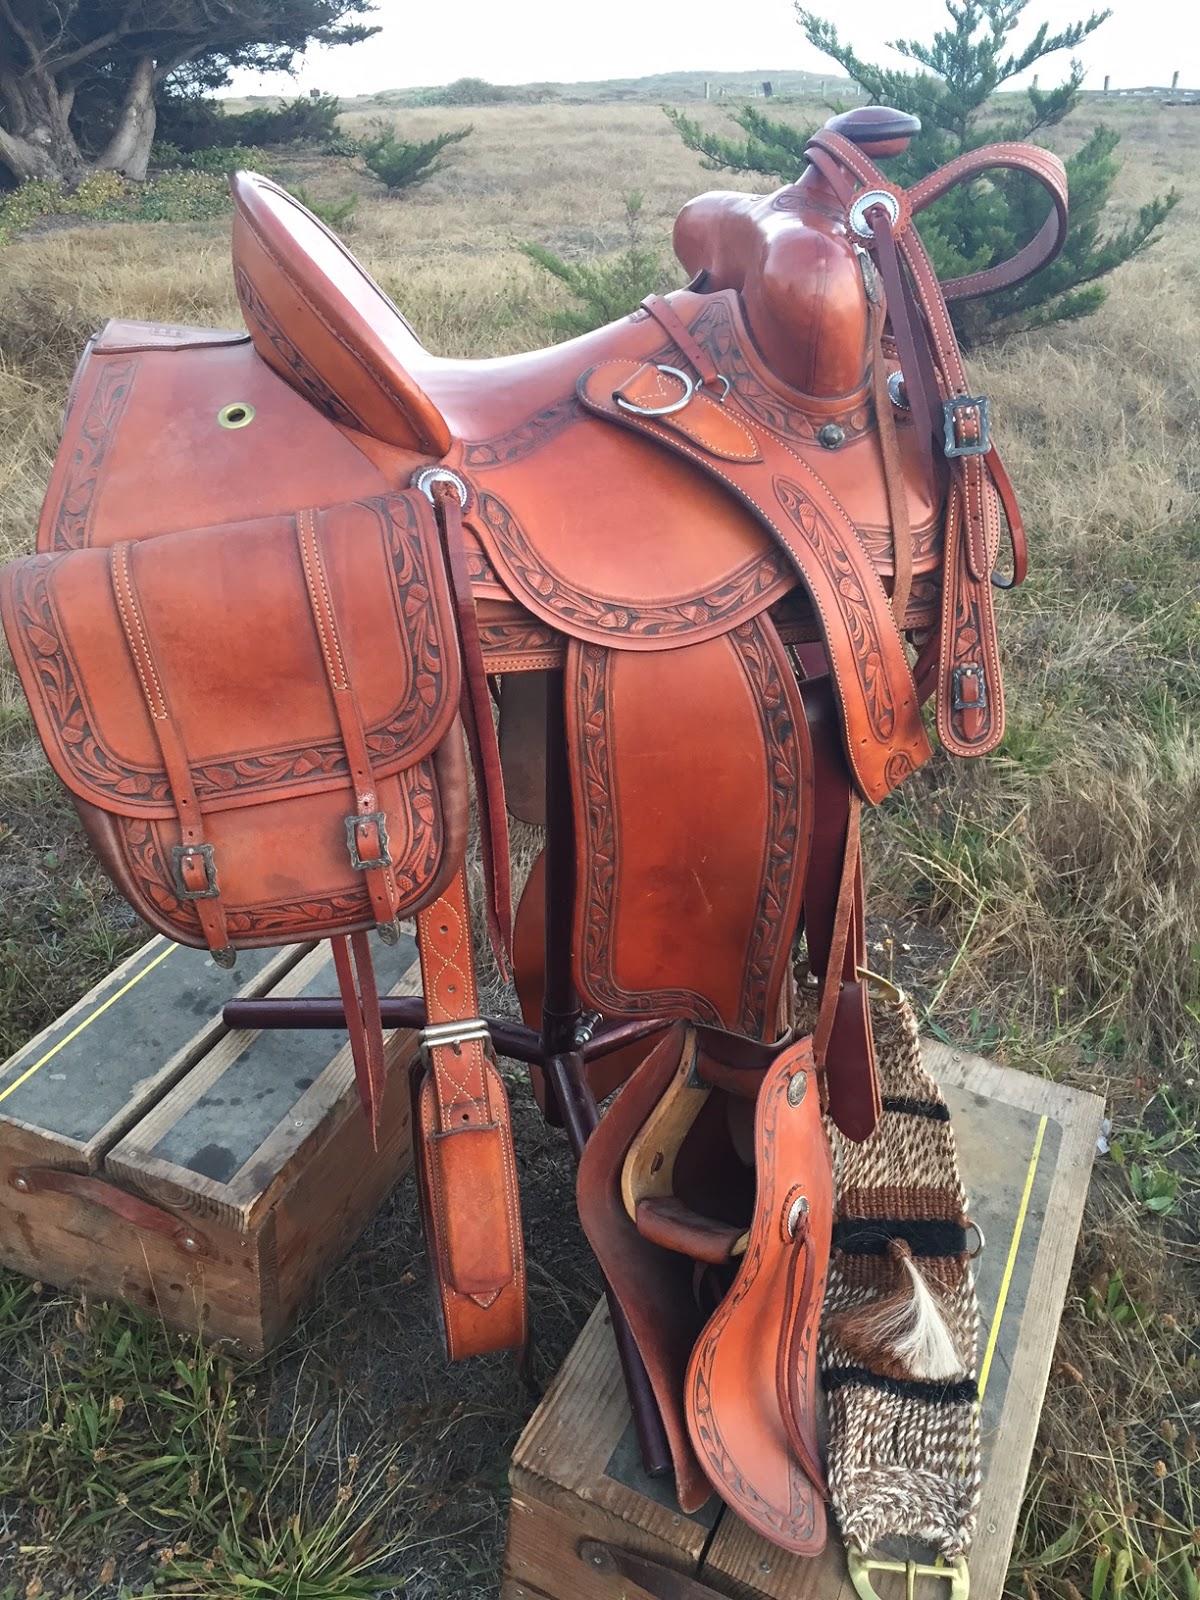 Buckaroo Leather Horse Tack, Use, Care and Maintenance